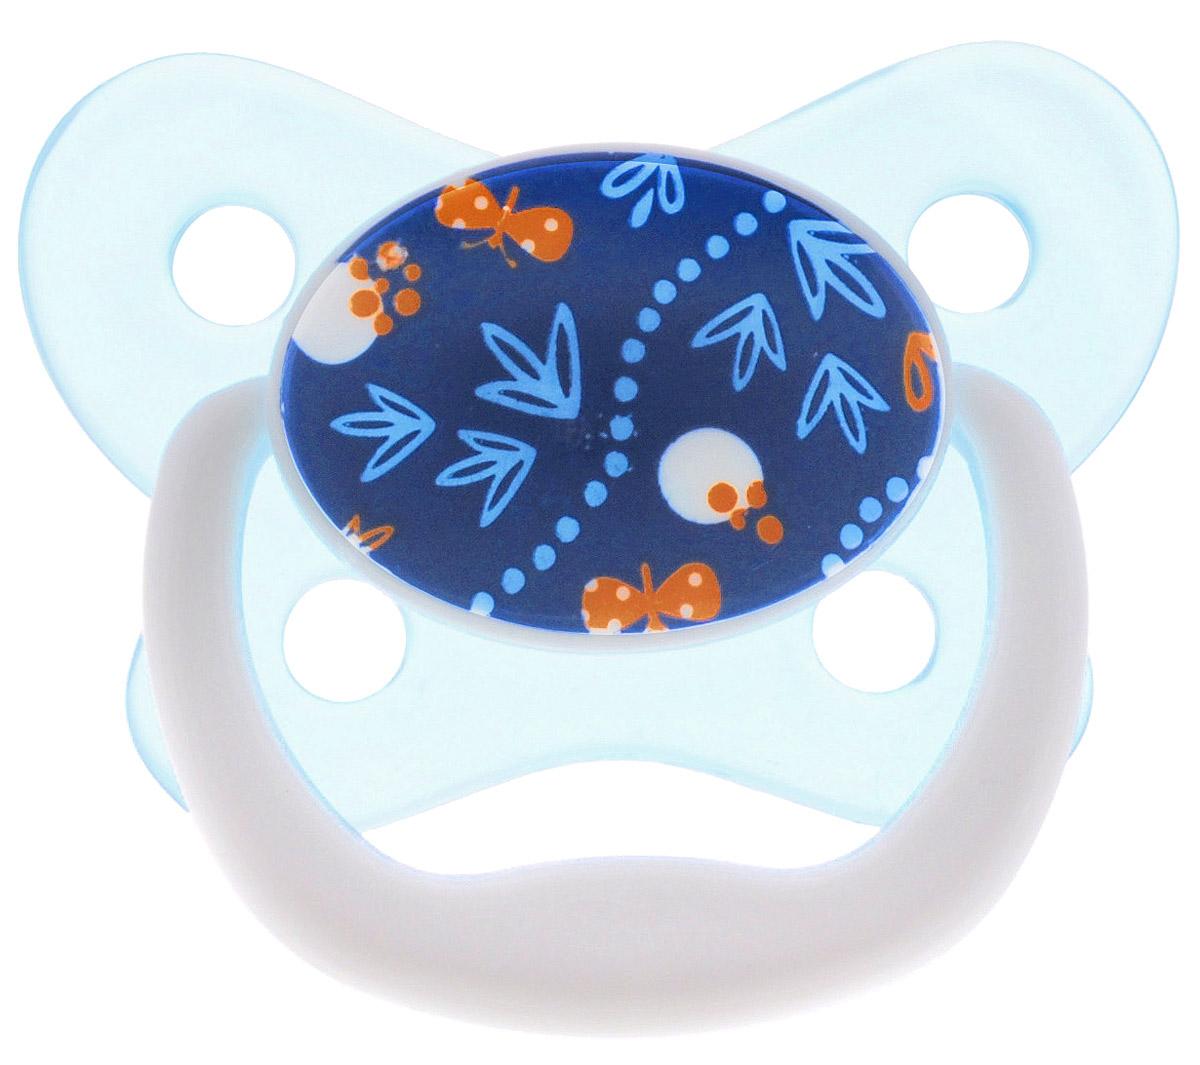 Dr. Brown's Пустышка PreVent Бабочка от 6 до 12 месяцев цвет бирюзовый синий